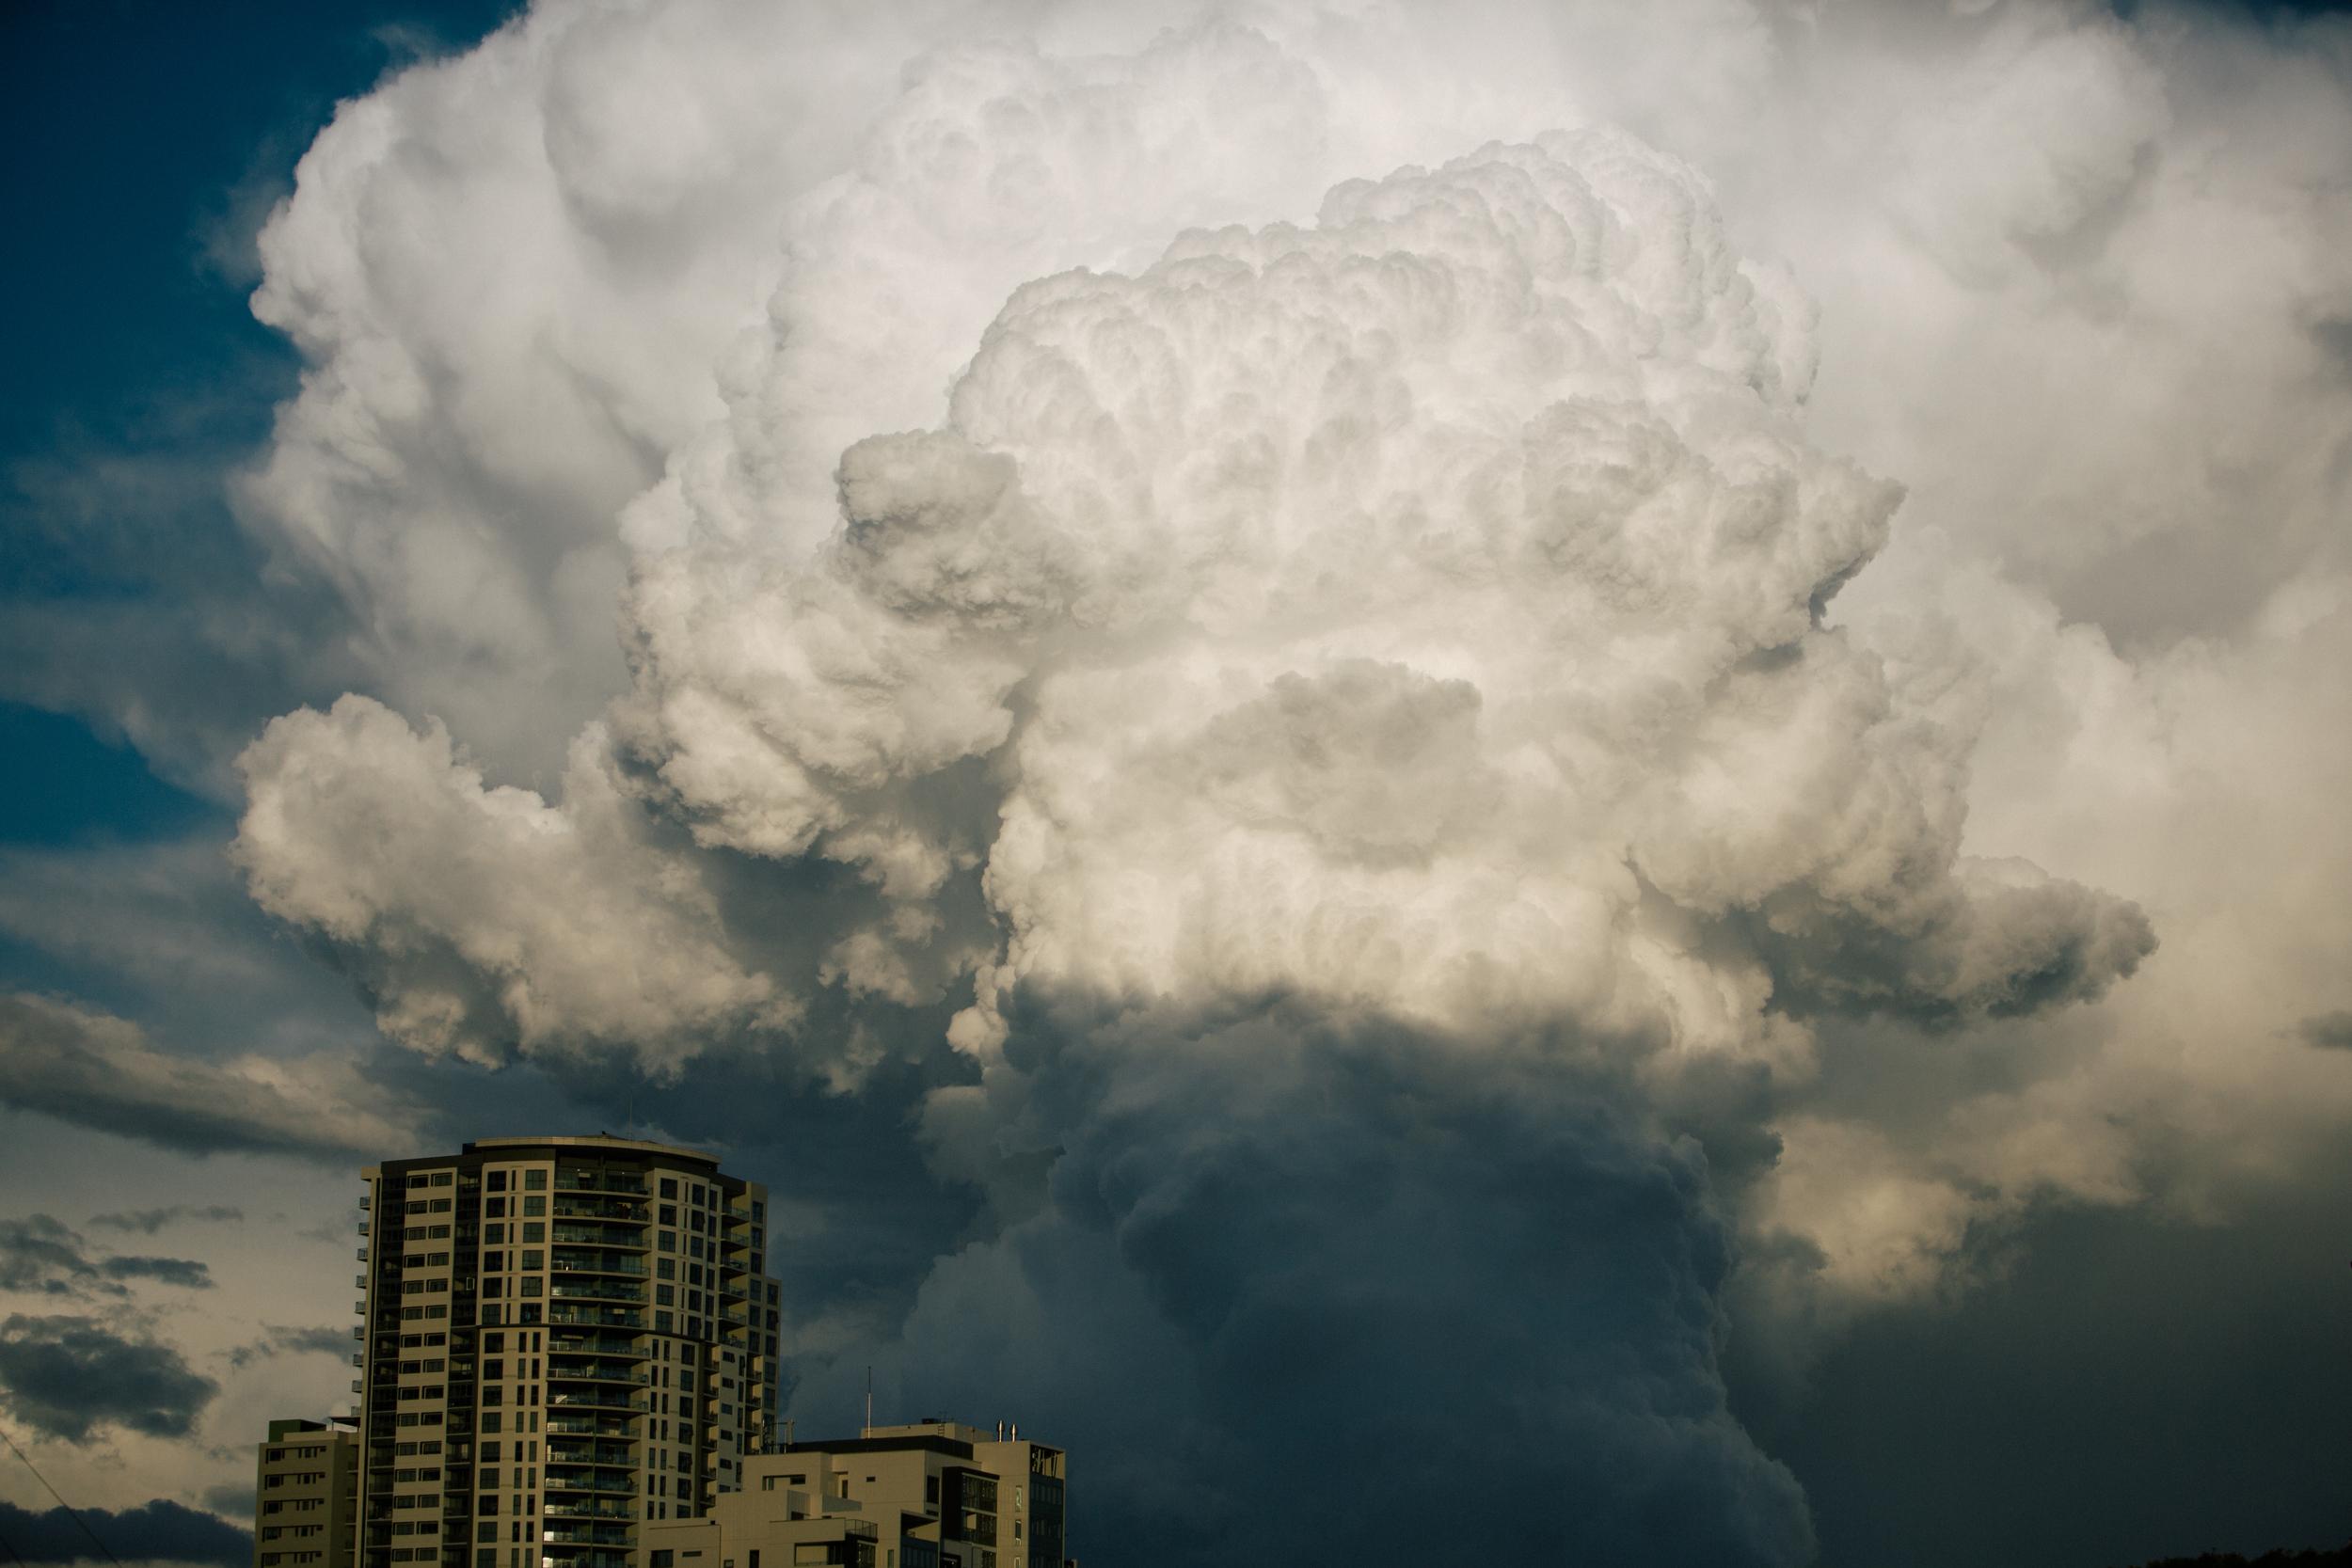 Clouds_LanewayBrisbane_31January2015_MiaForrest_104A3891.jpg